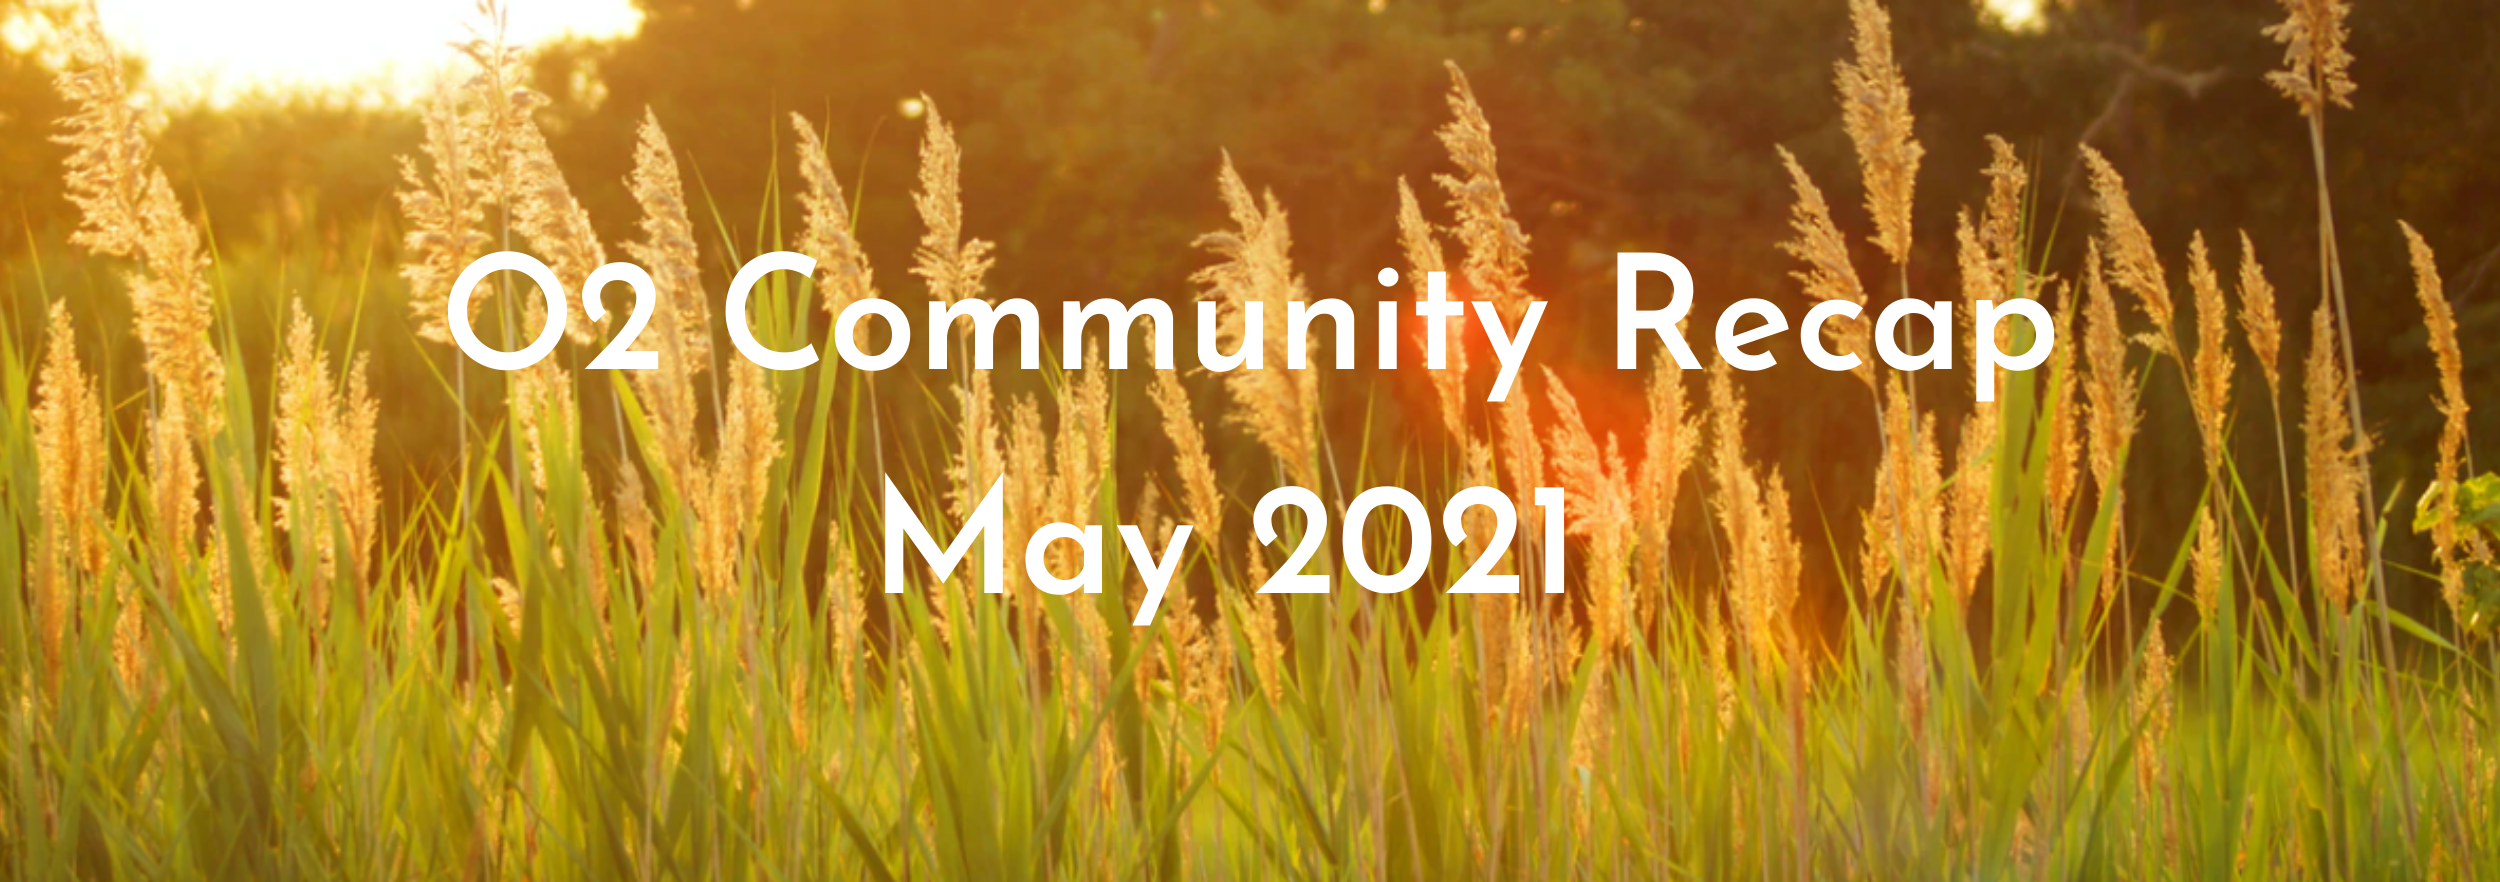 O2 Community recap August 2020 (3).png